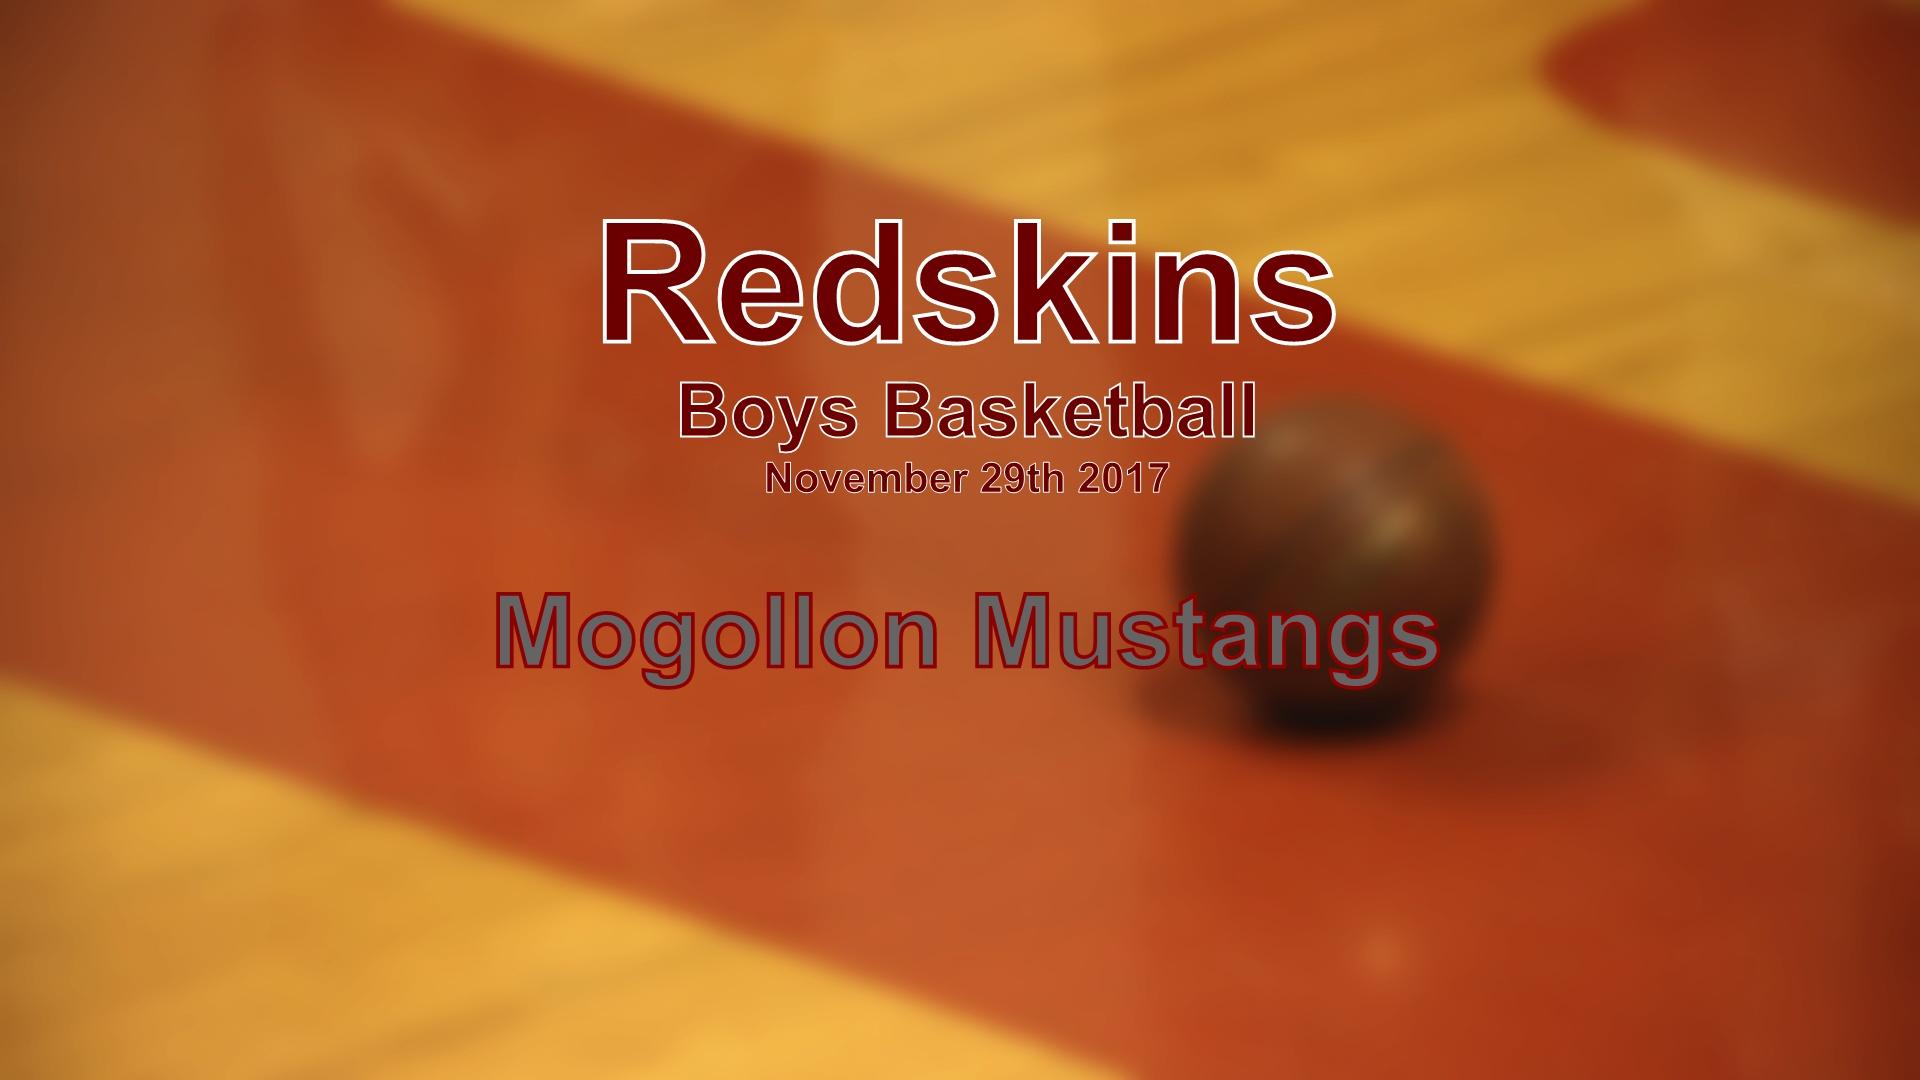 2017-11-BoysBasketball-Mogollon